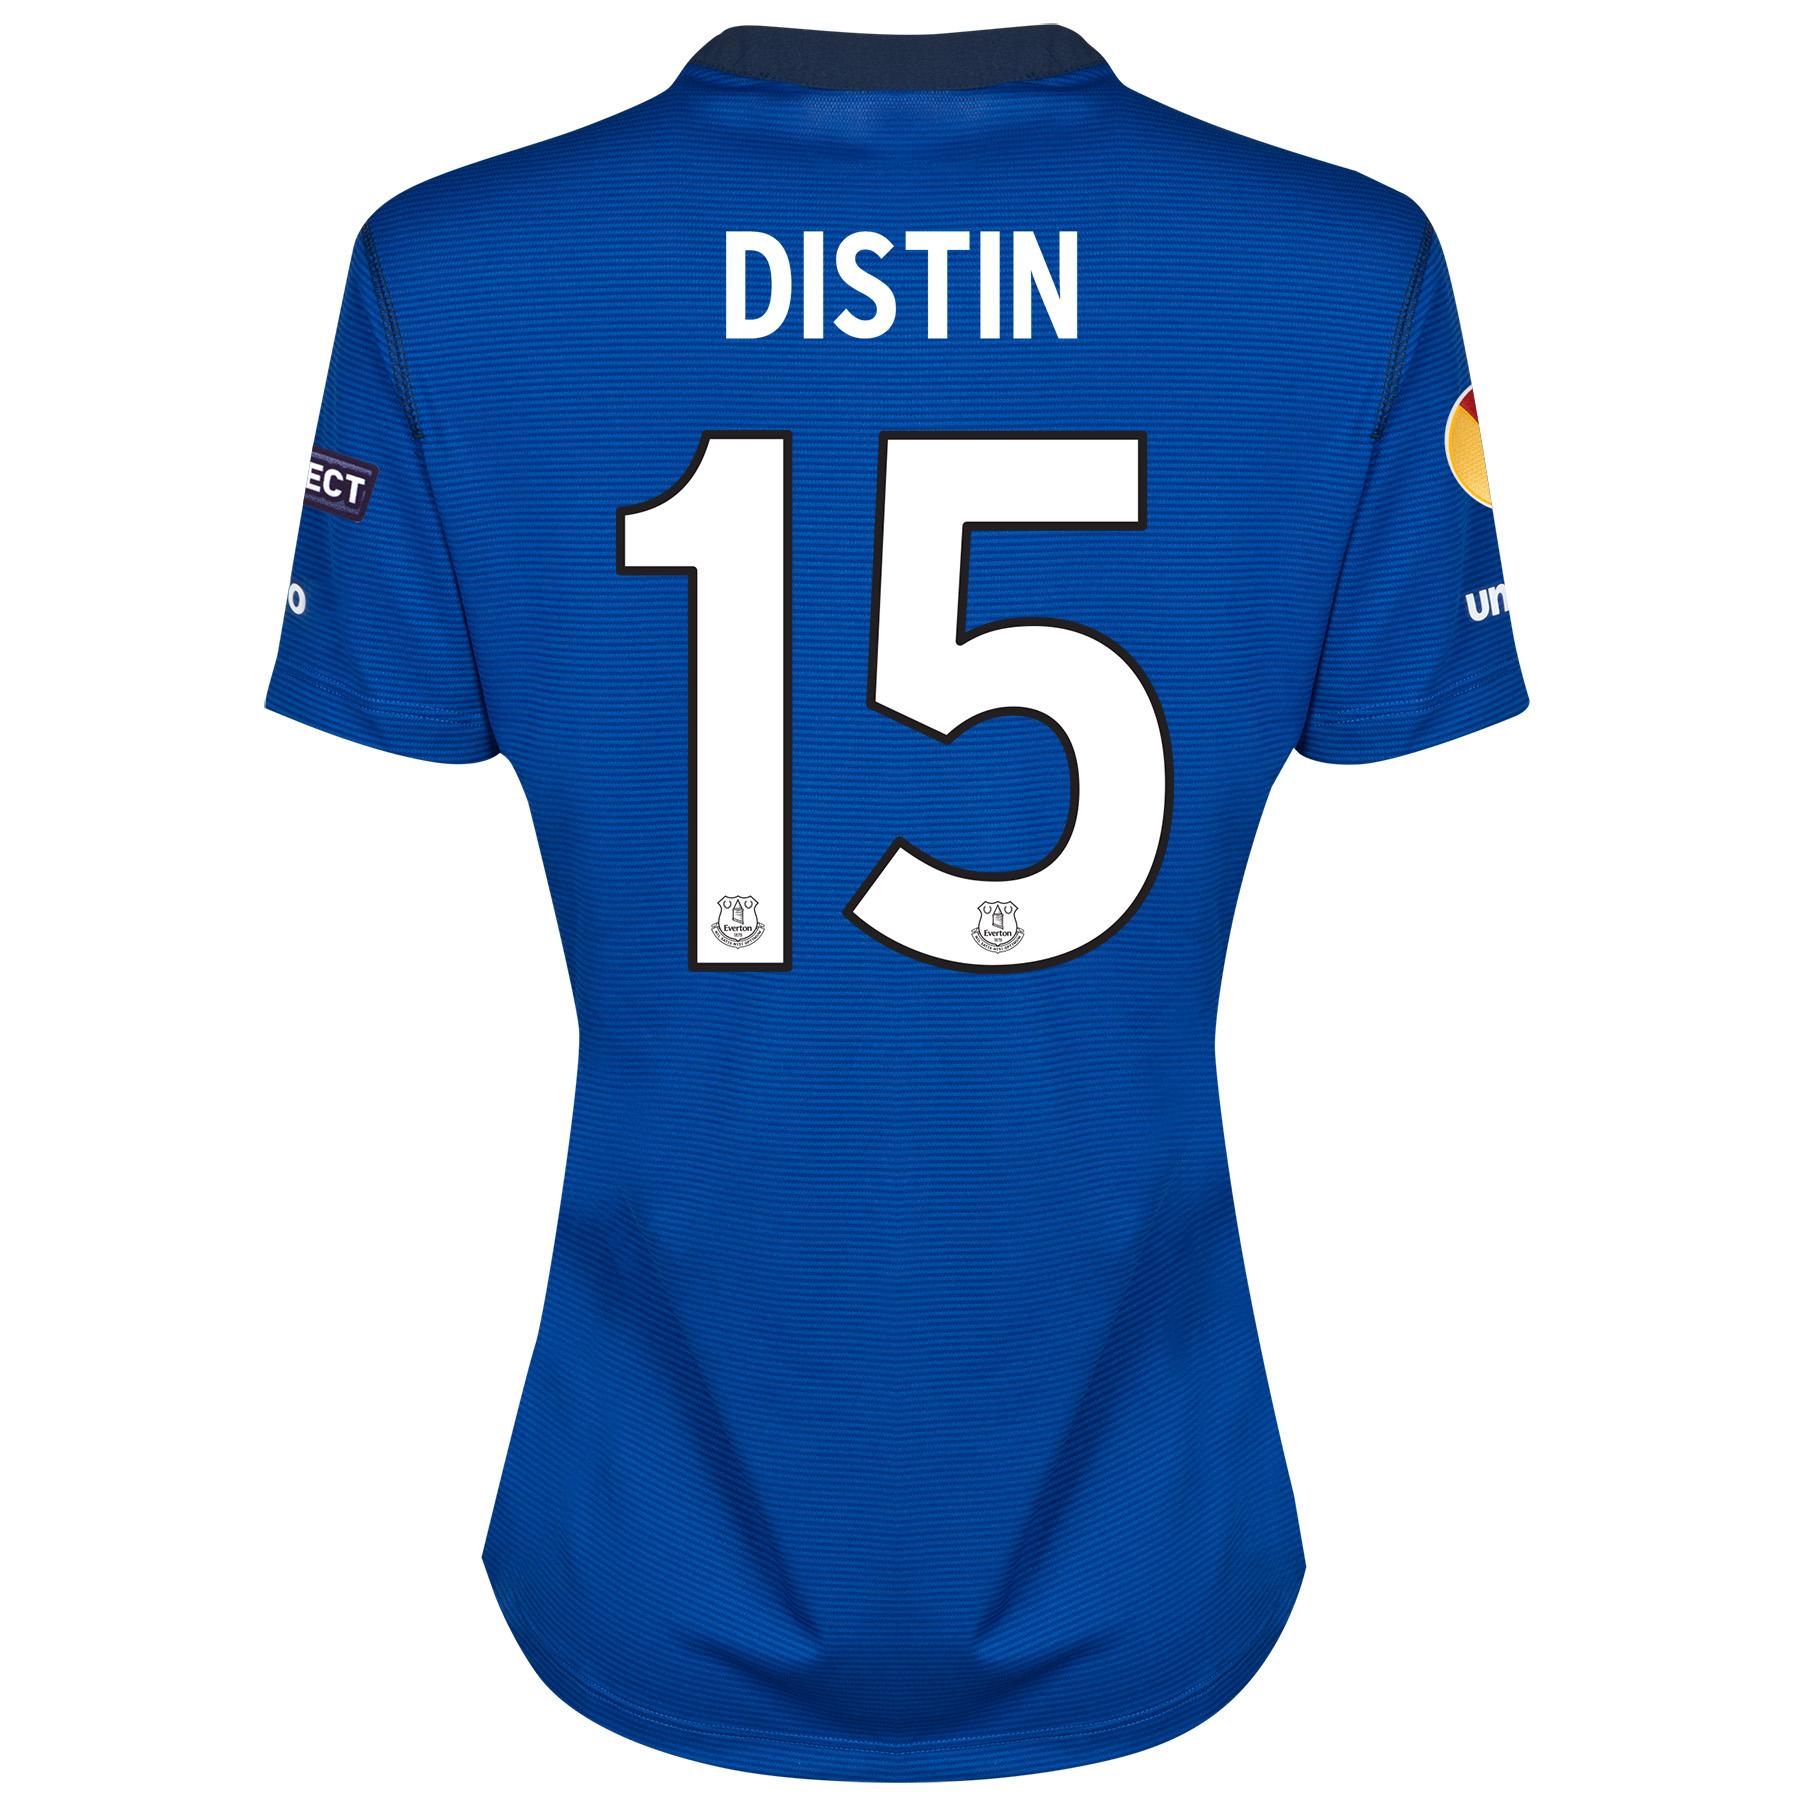 Everton UEFA Europa League Home Shirt 2014/15 - Womens with Distin 15 printing